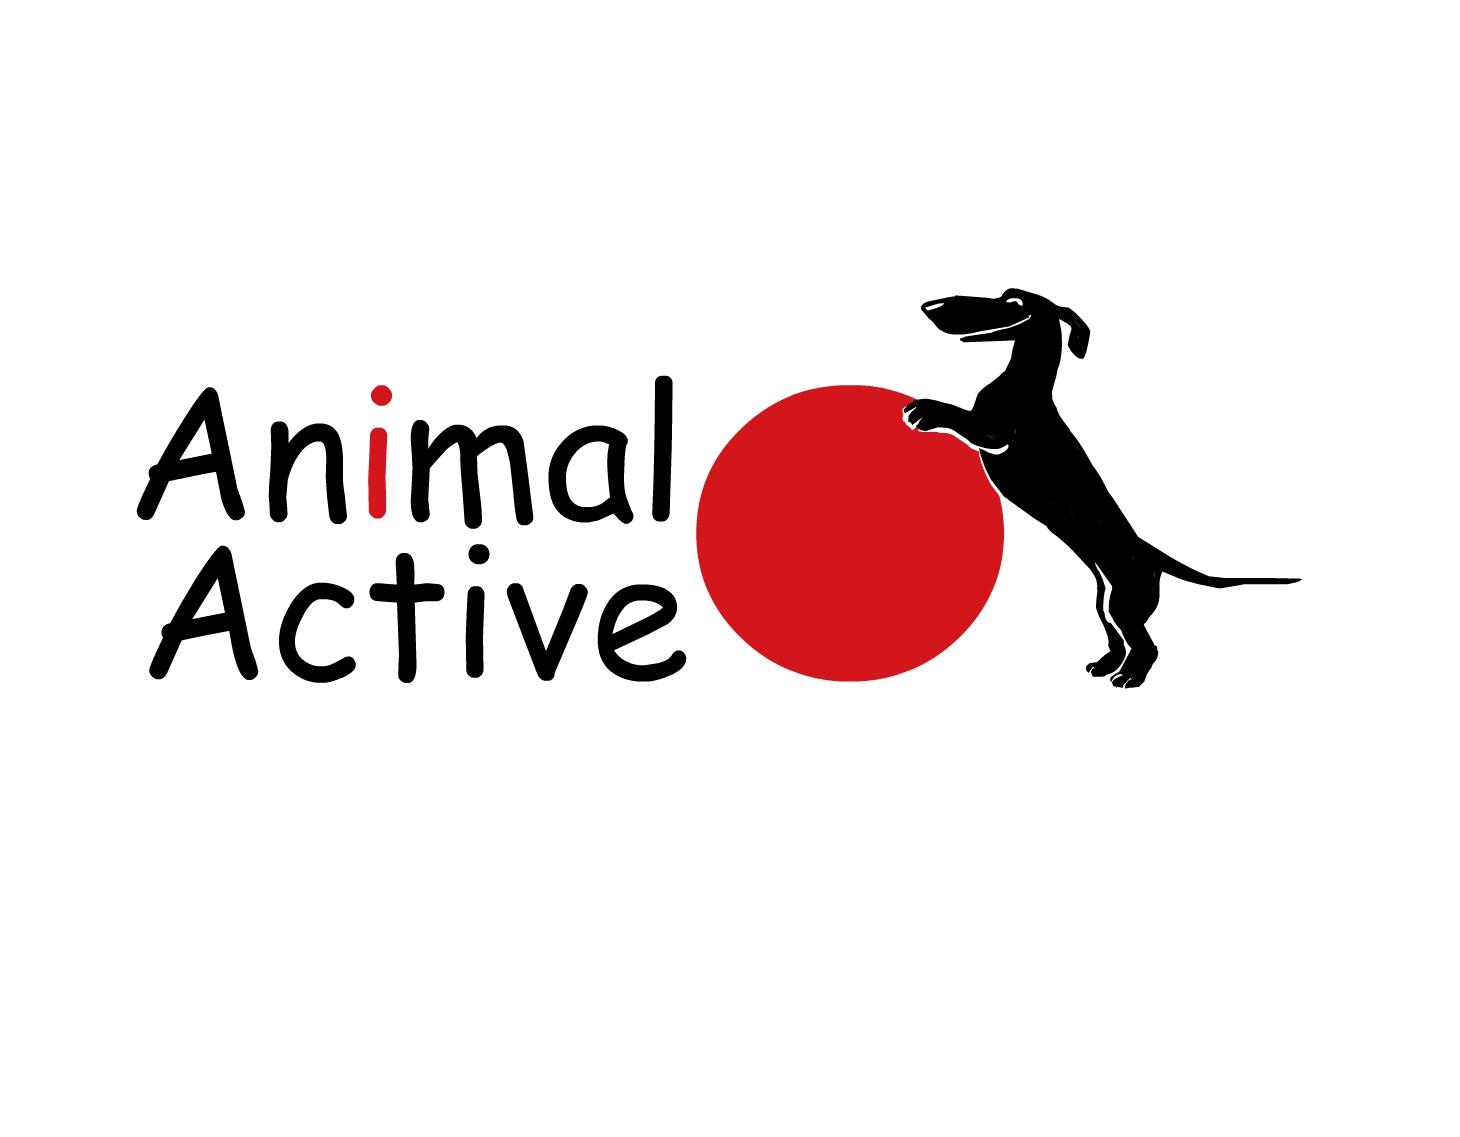 Animal Active logo (2)